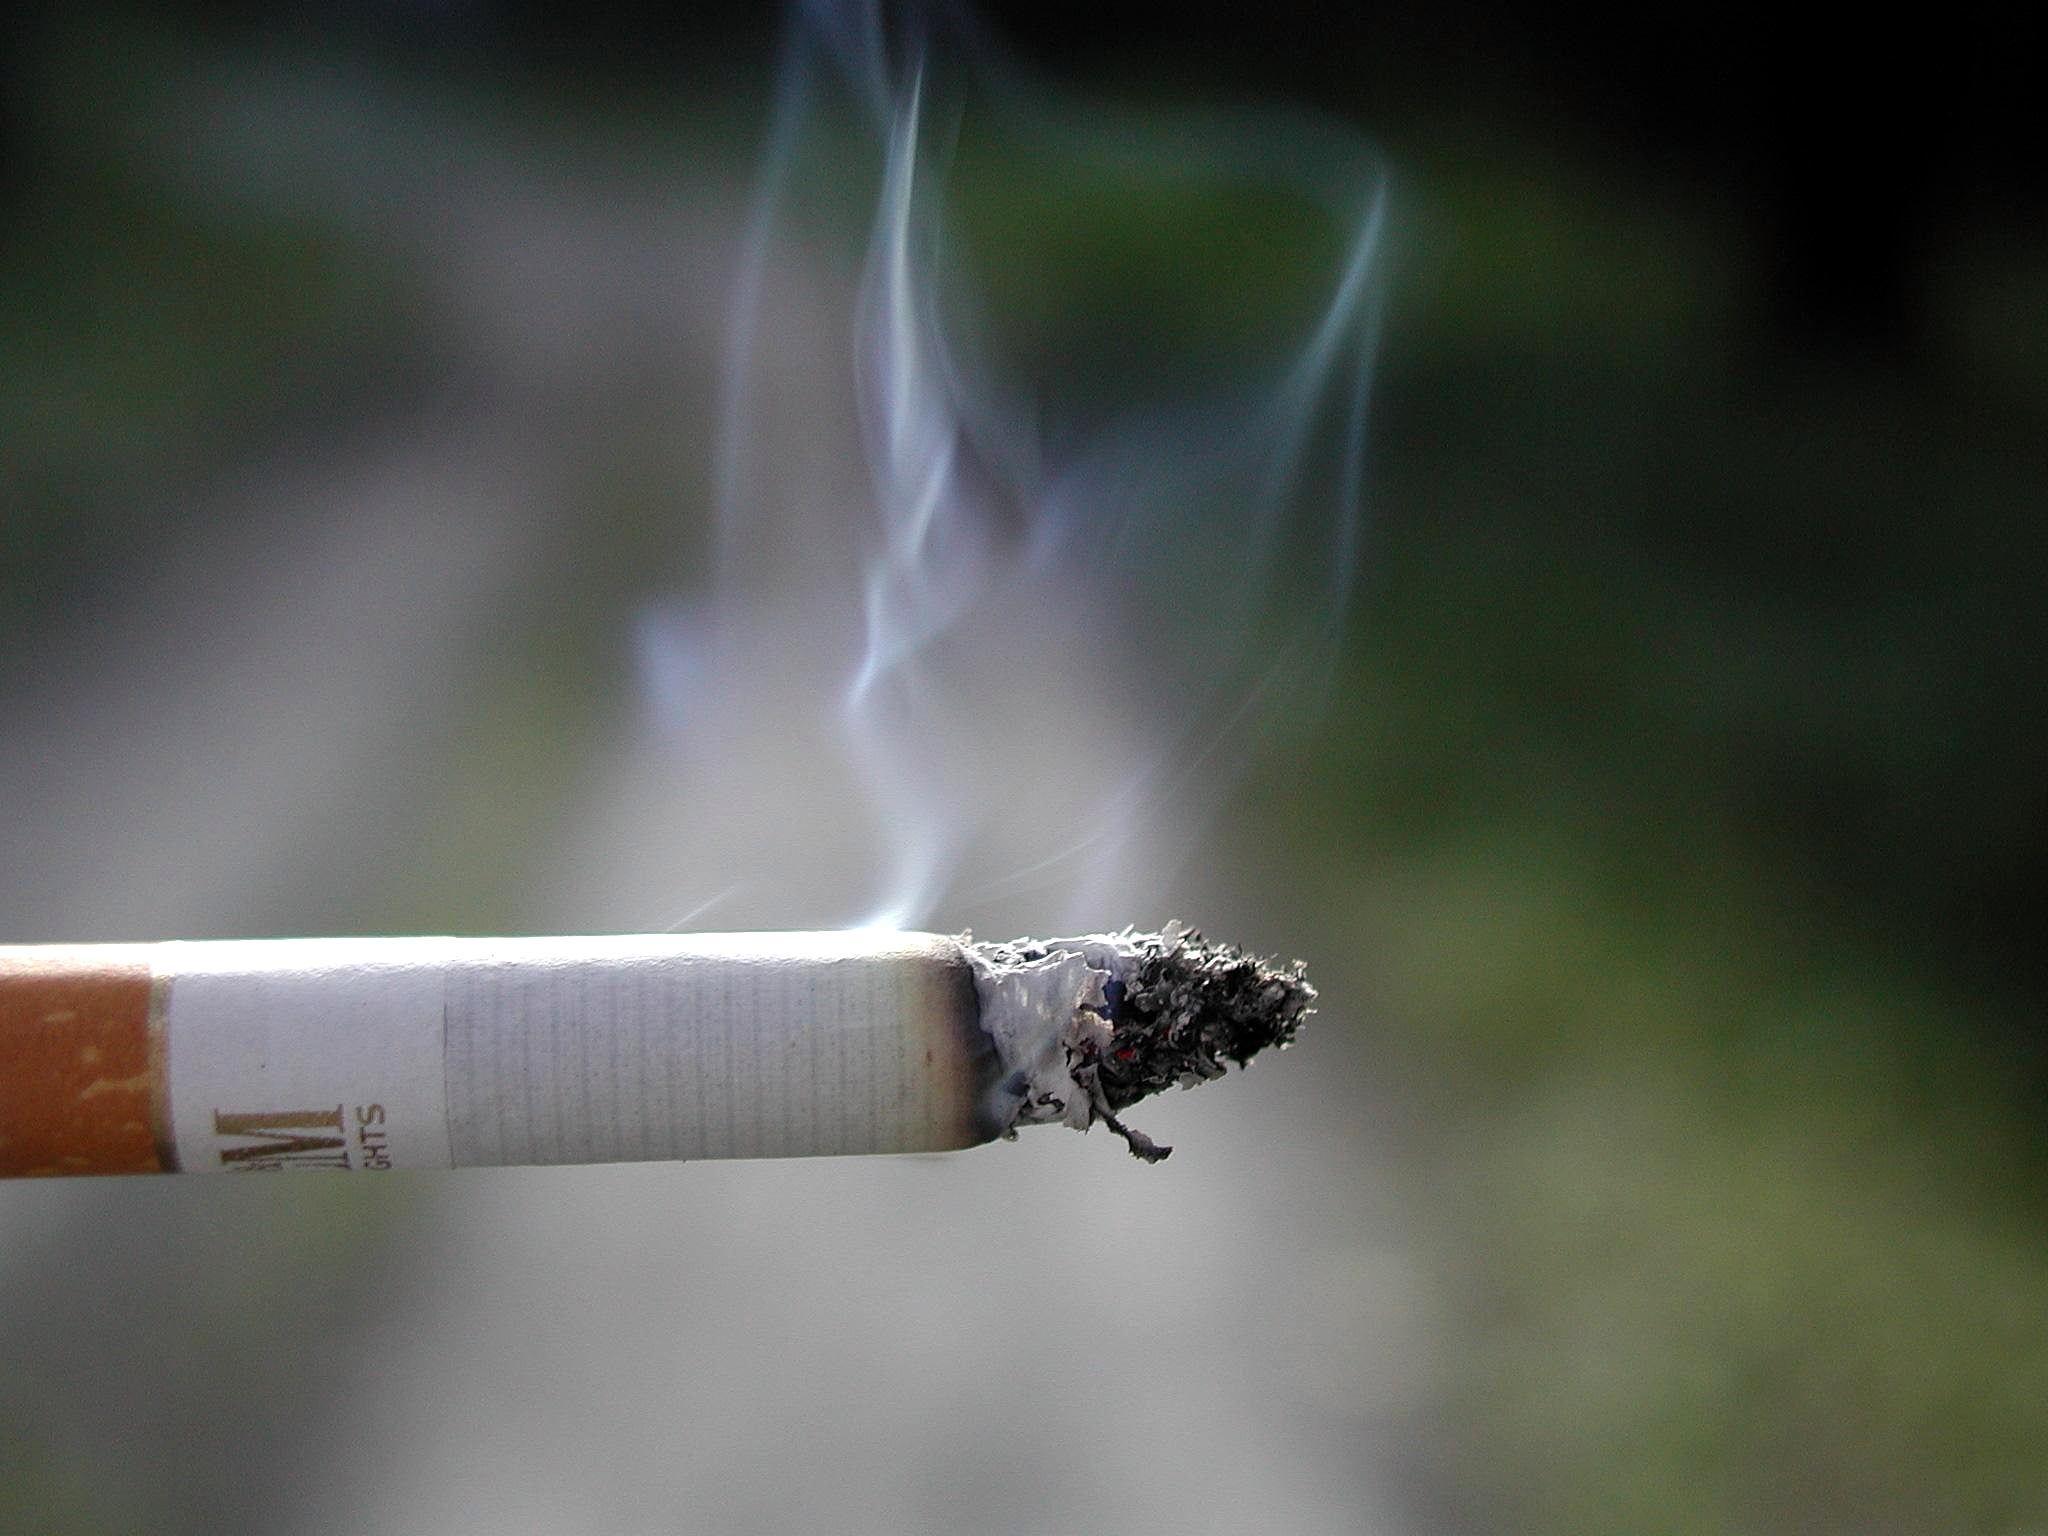 Romania's cigarette black market grows to 16% in July - researcher